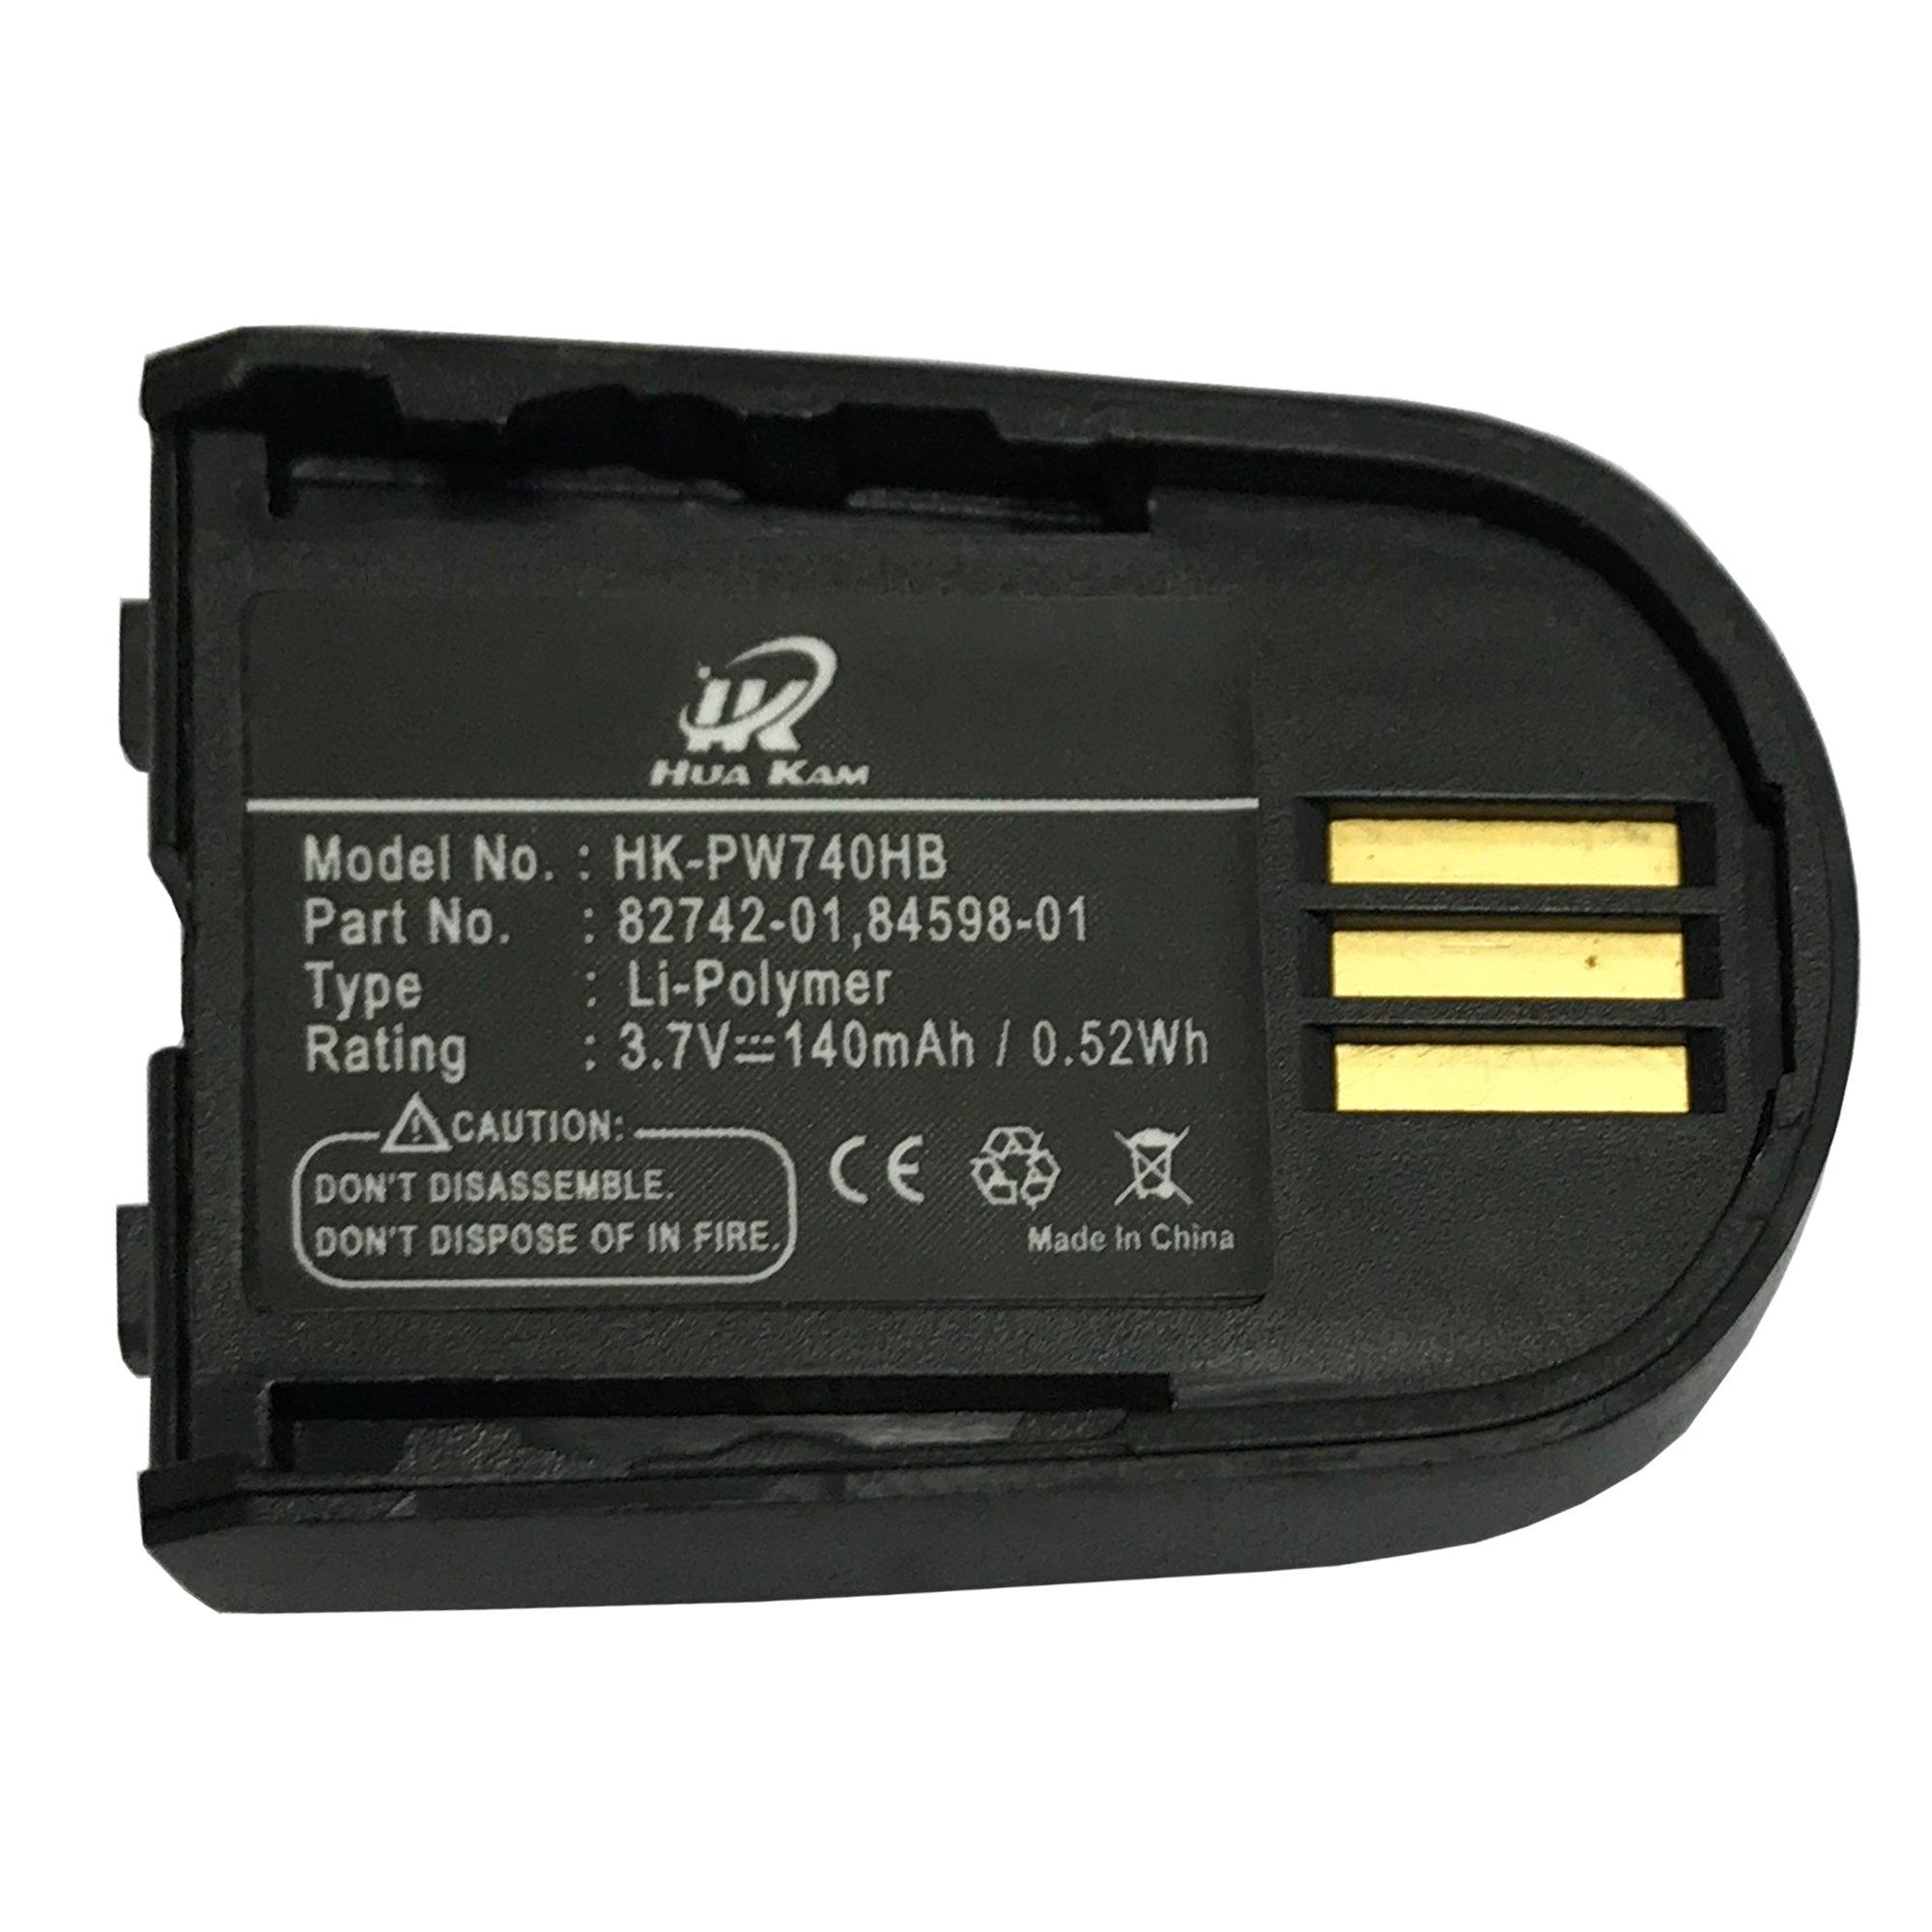 HUAKAM, 204755-01, 82742-01, 84598-01, Savi 740 Replacement Battery for Plantronics Savi 740, Savi 440, Savi W440, Savi W745, (Savi 740 Battery (1 Pack)) by KAMHUA